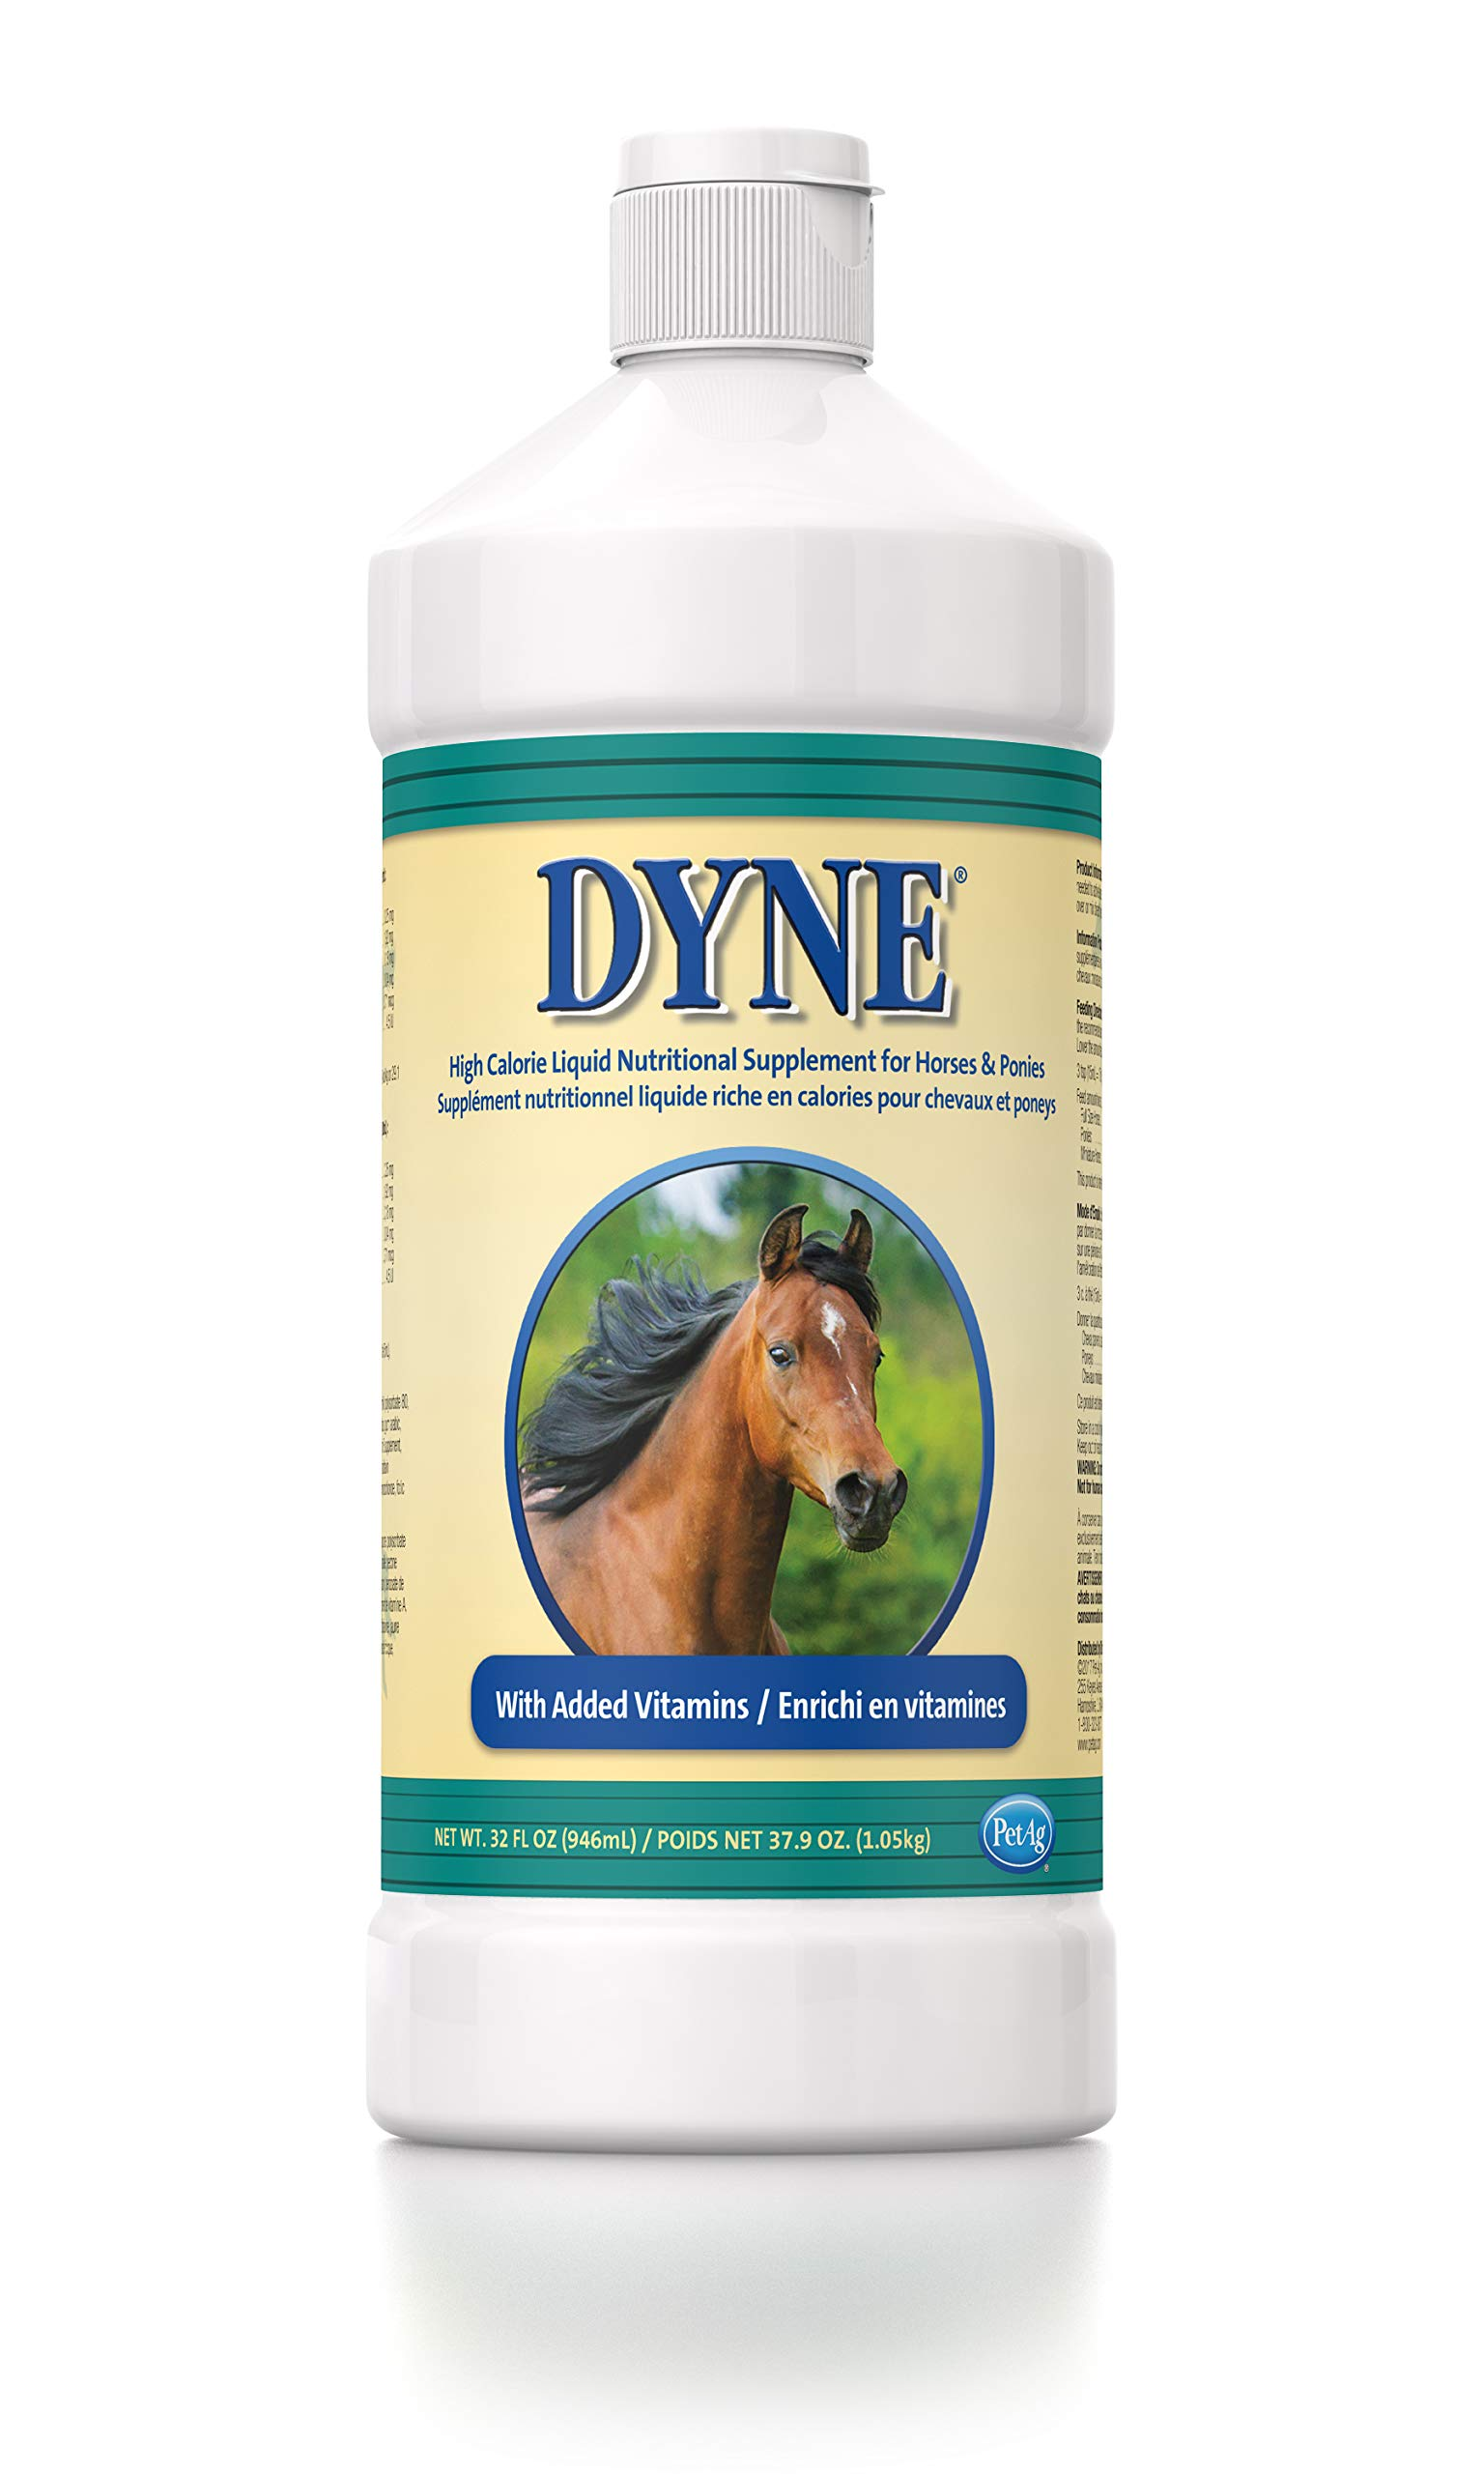 Dyne High Calorie Liquid for Horses, 32 oz by Dyne